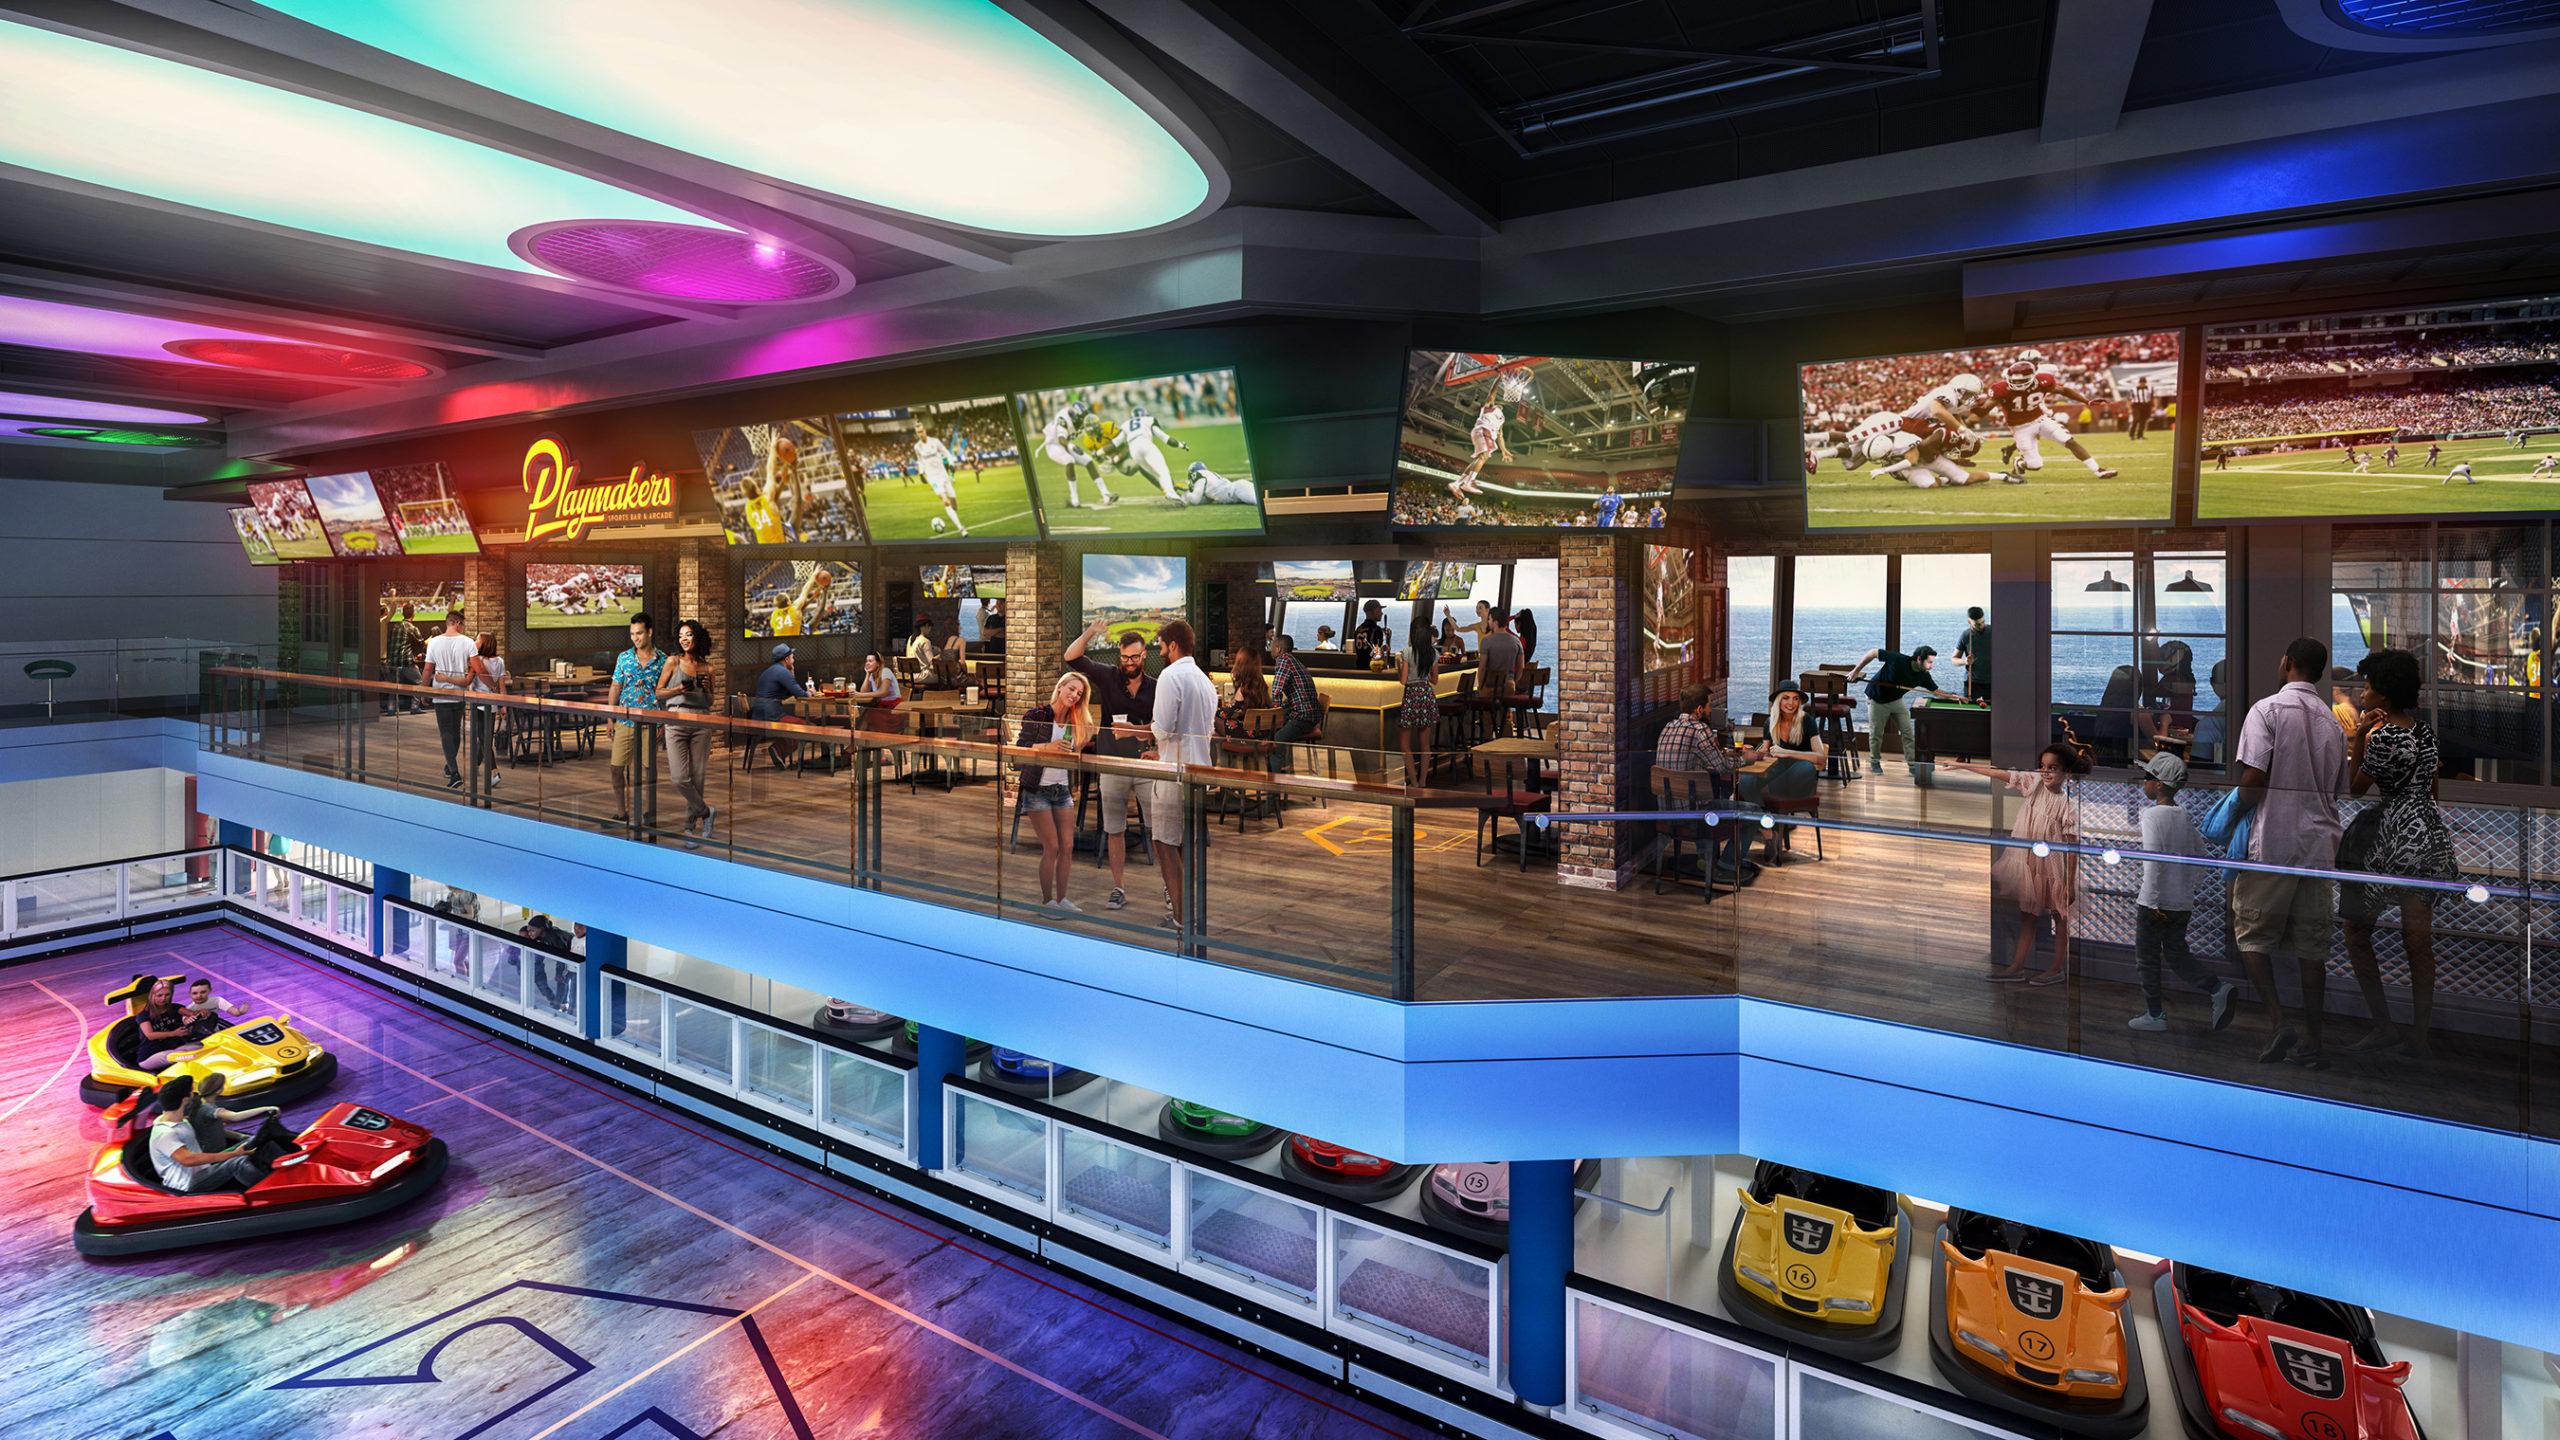 Arcade Odyssey of the seas Royal Caribbean International